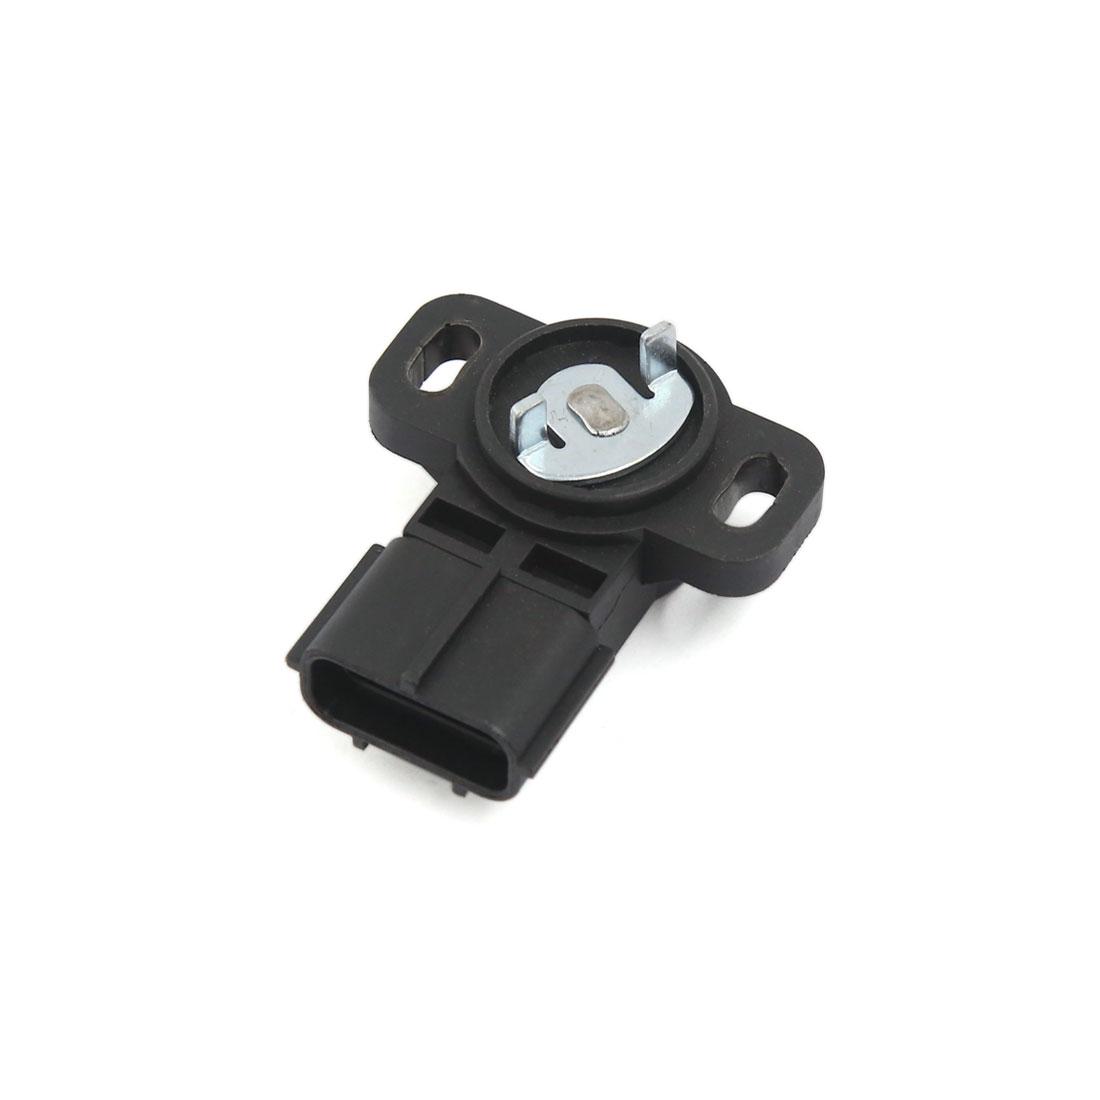 Throttle Position Sensor 35102-39000 Fits For 2002-2005 Kia Sedona Sorento